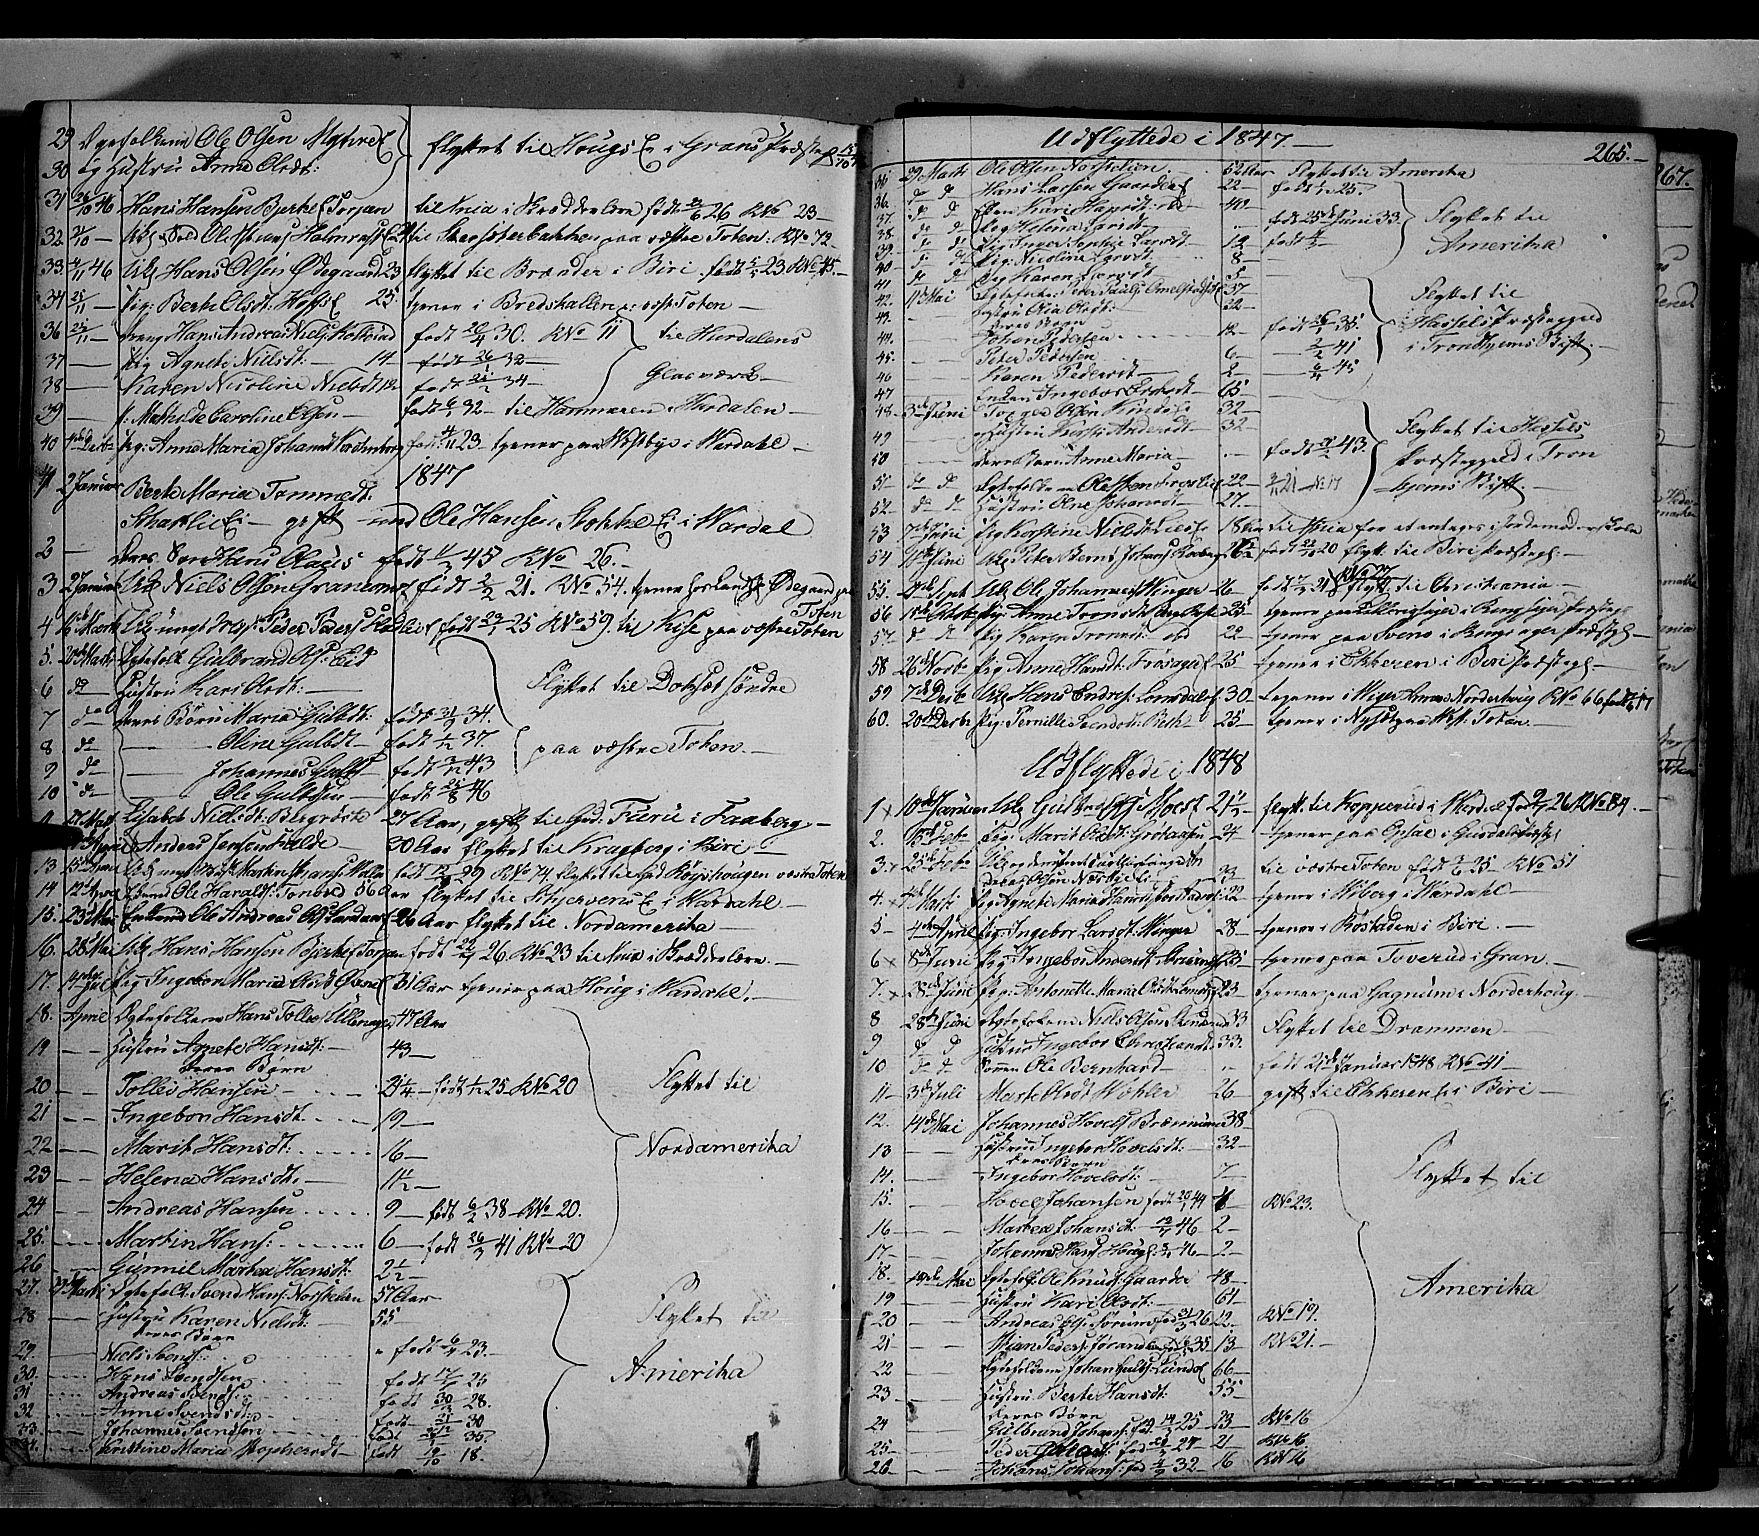 SAH, Land prestekontor, Klokkerbok nr. 2, 1833-1849, s. 265